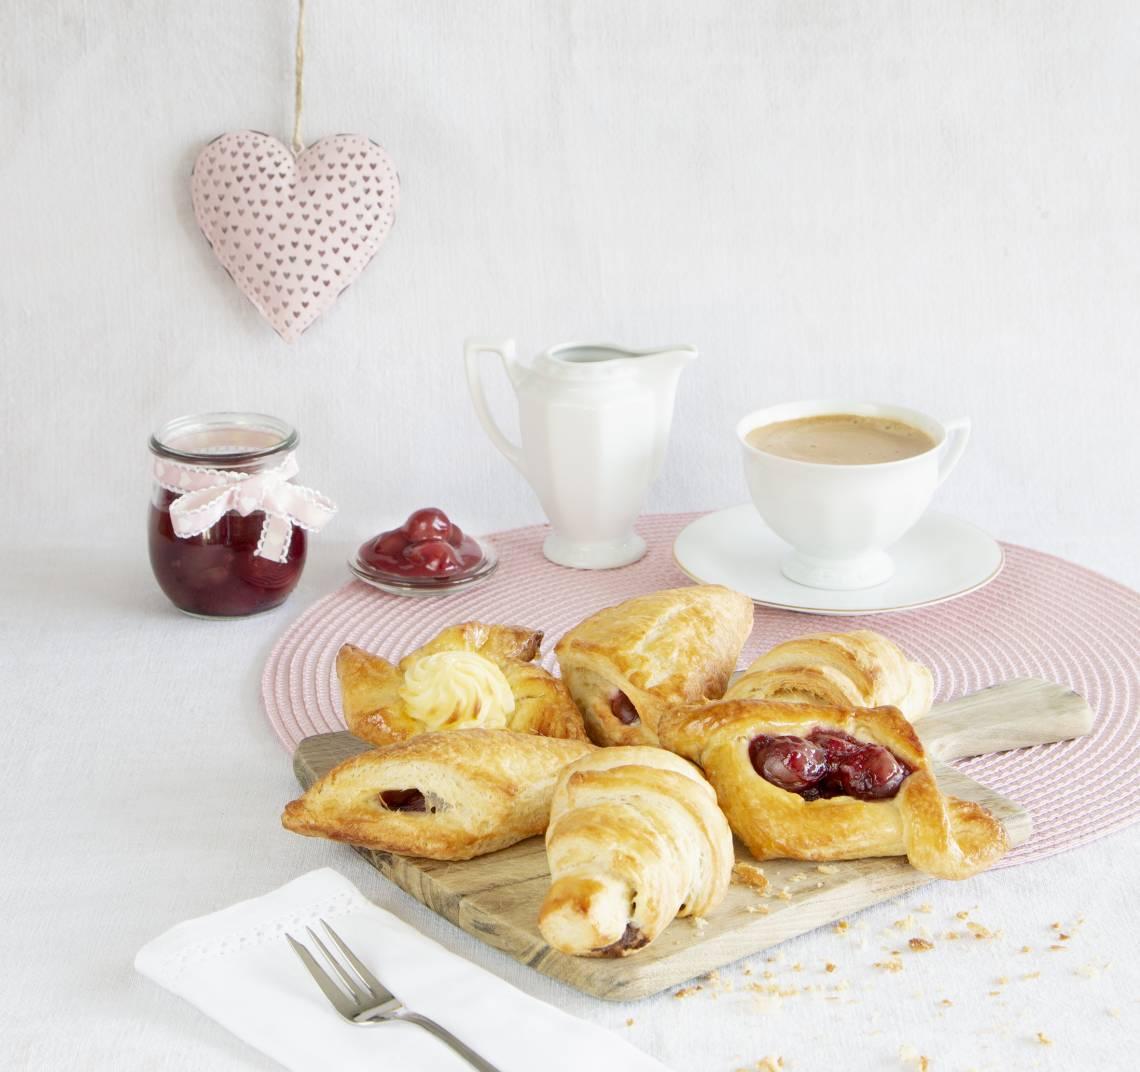 STÄDTER - we love baking - Herdbackblech - Ergebis frische Hörnchen